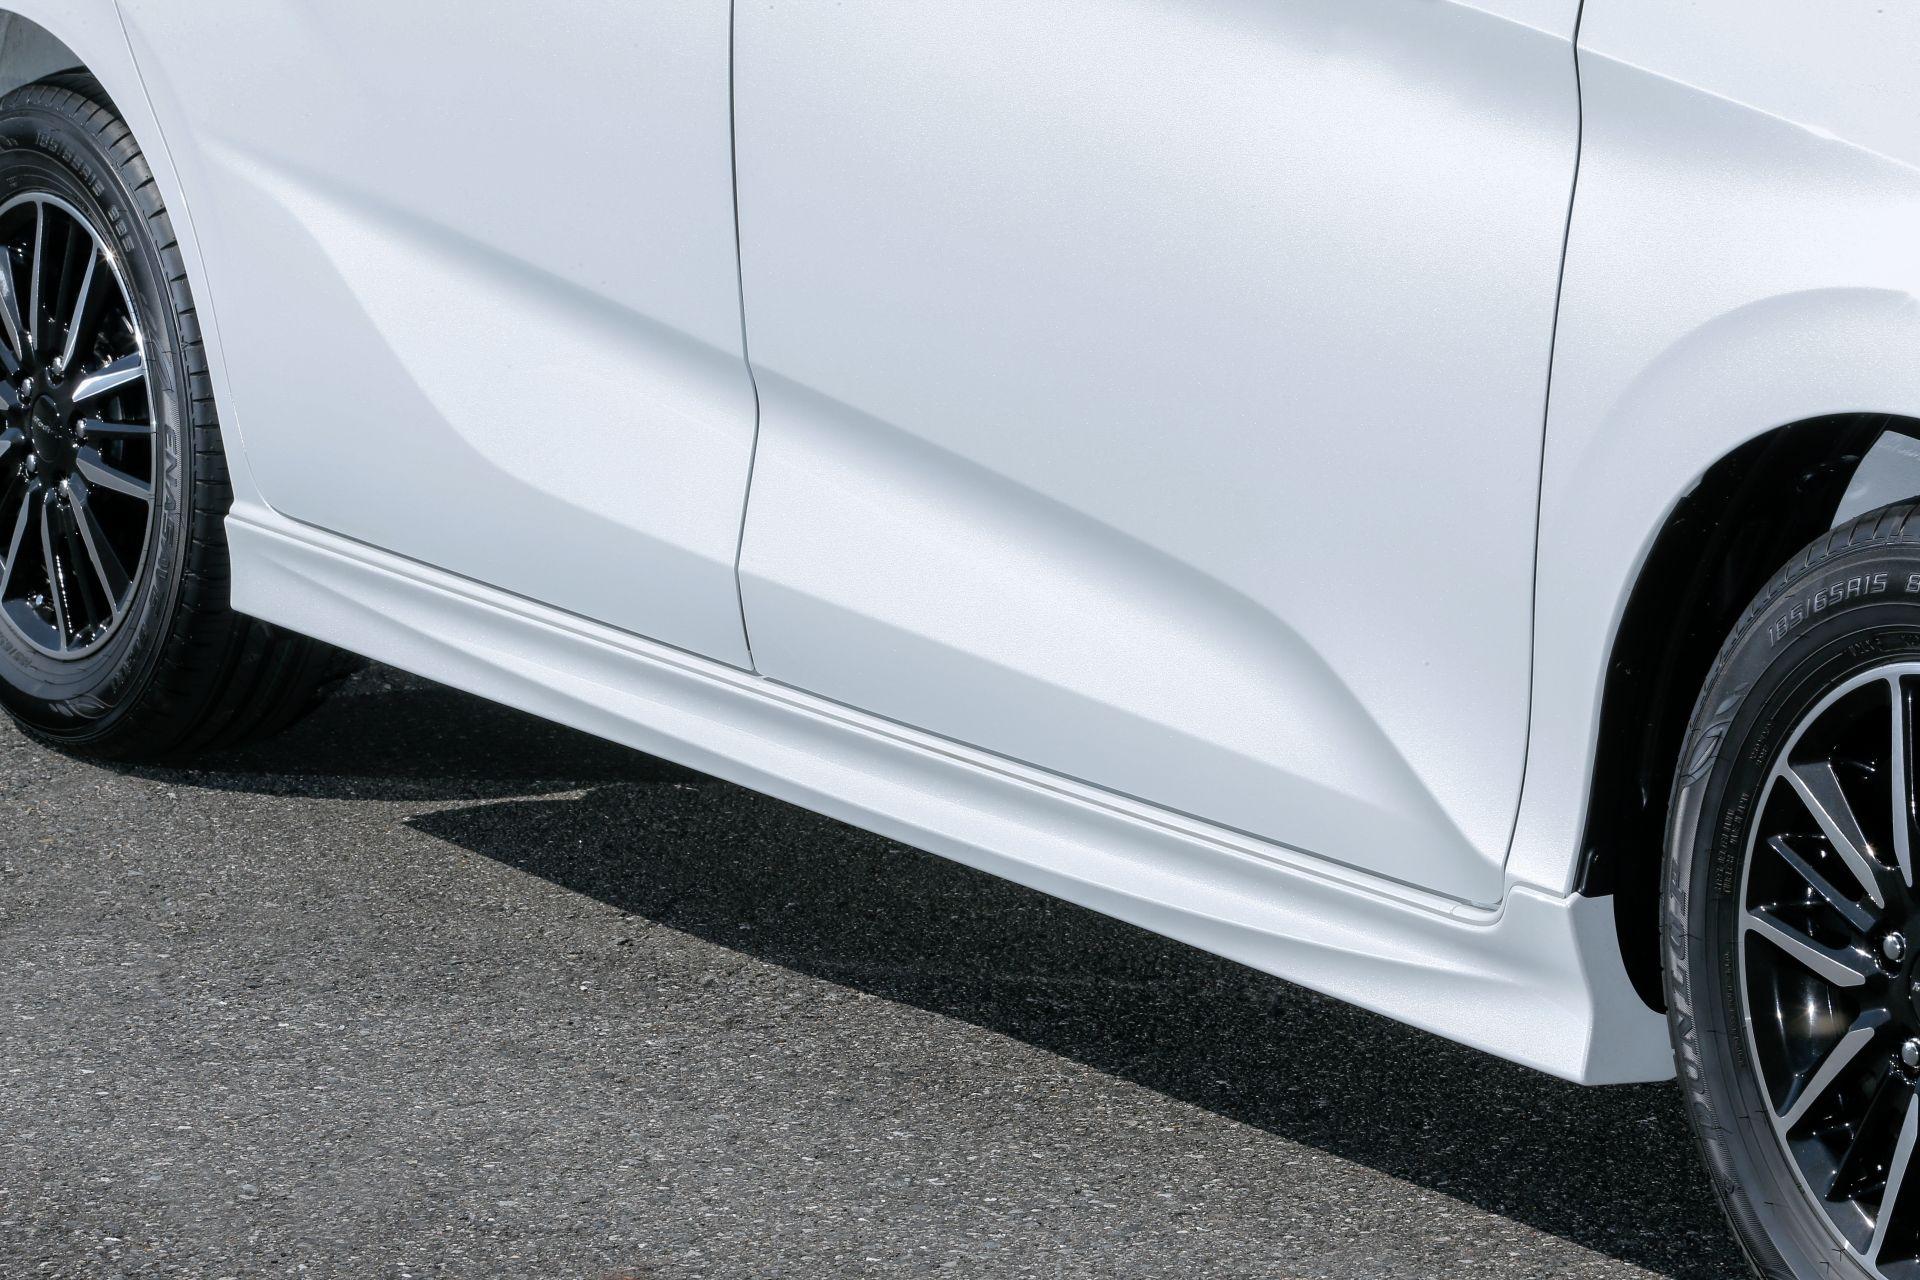 Honda-Freed-Modulo-X-Facelift-2020-15